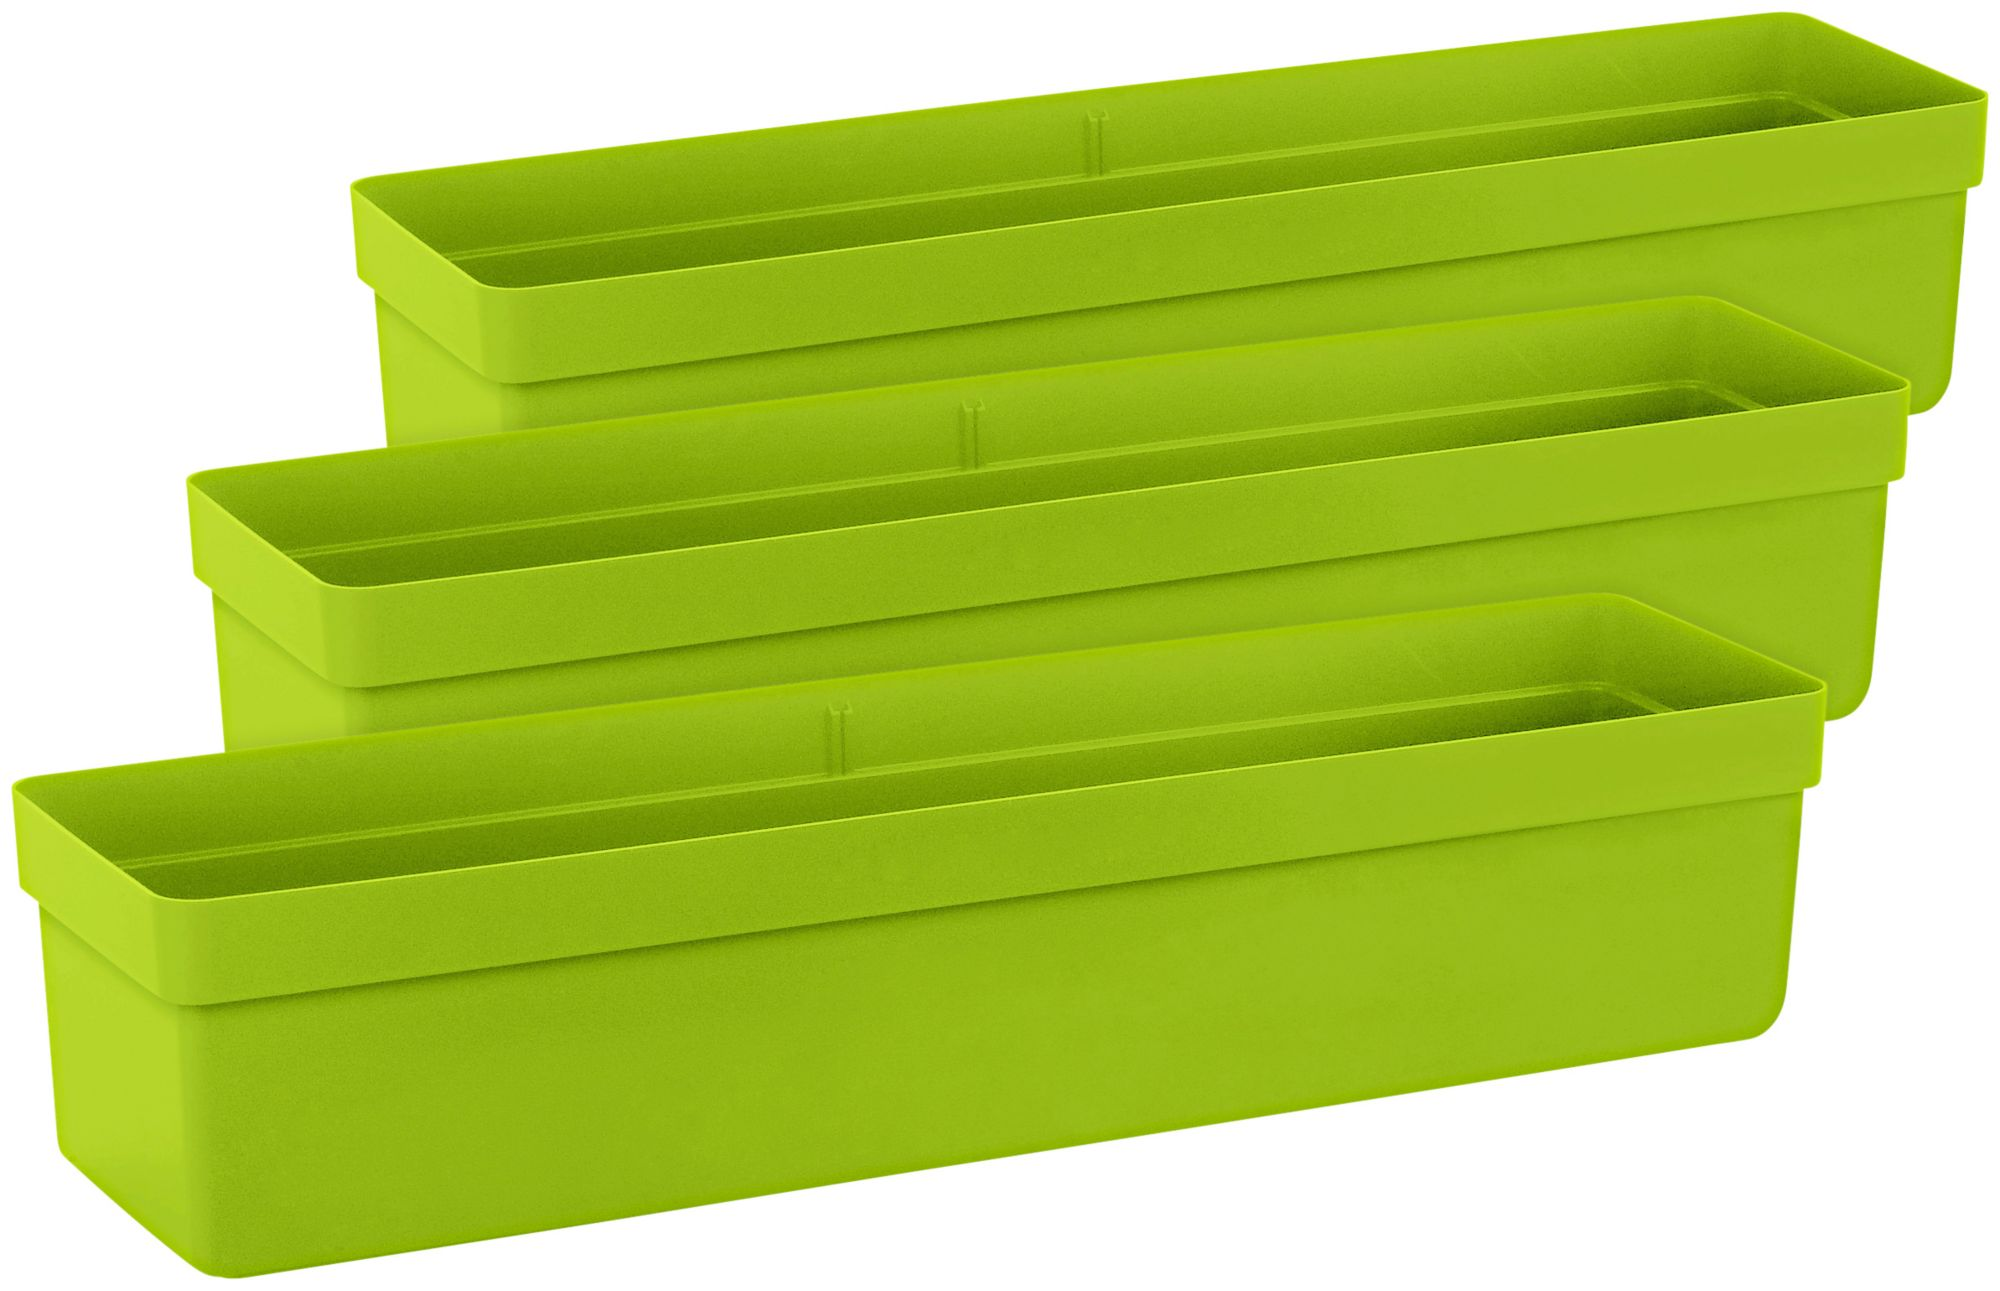 EMSA Emsa Blumenkasten »CITY CLA Kasten«, BxTxH: 75x20x16 cm, grün